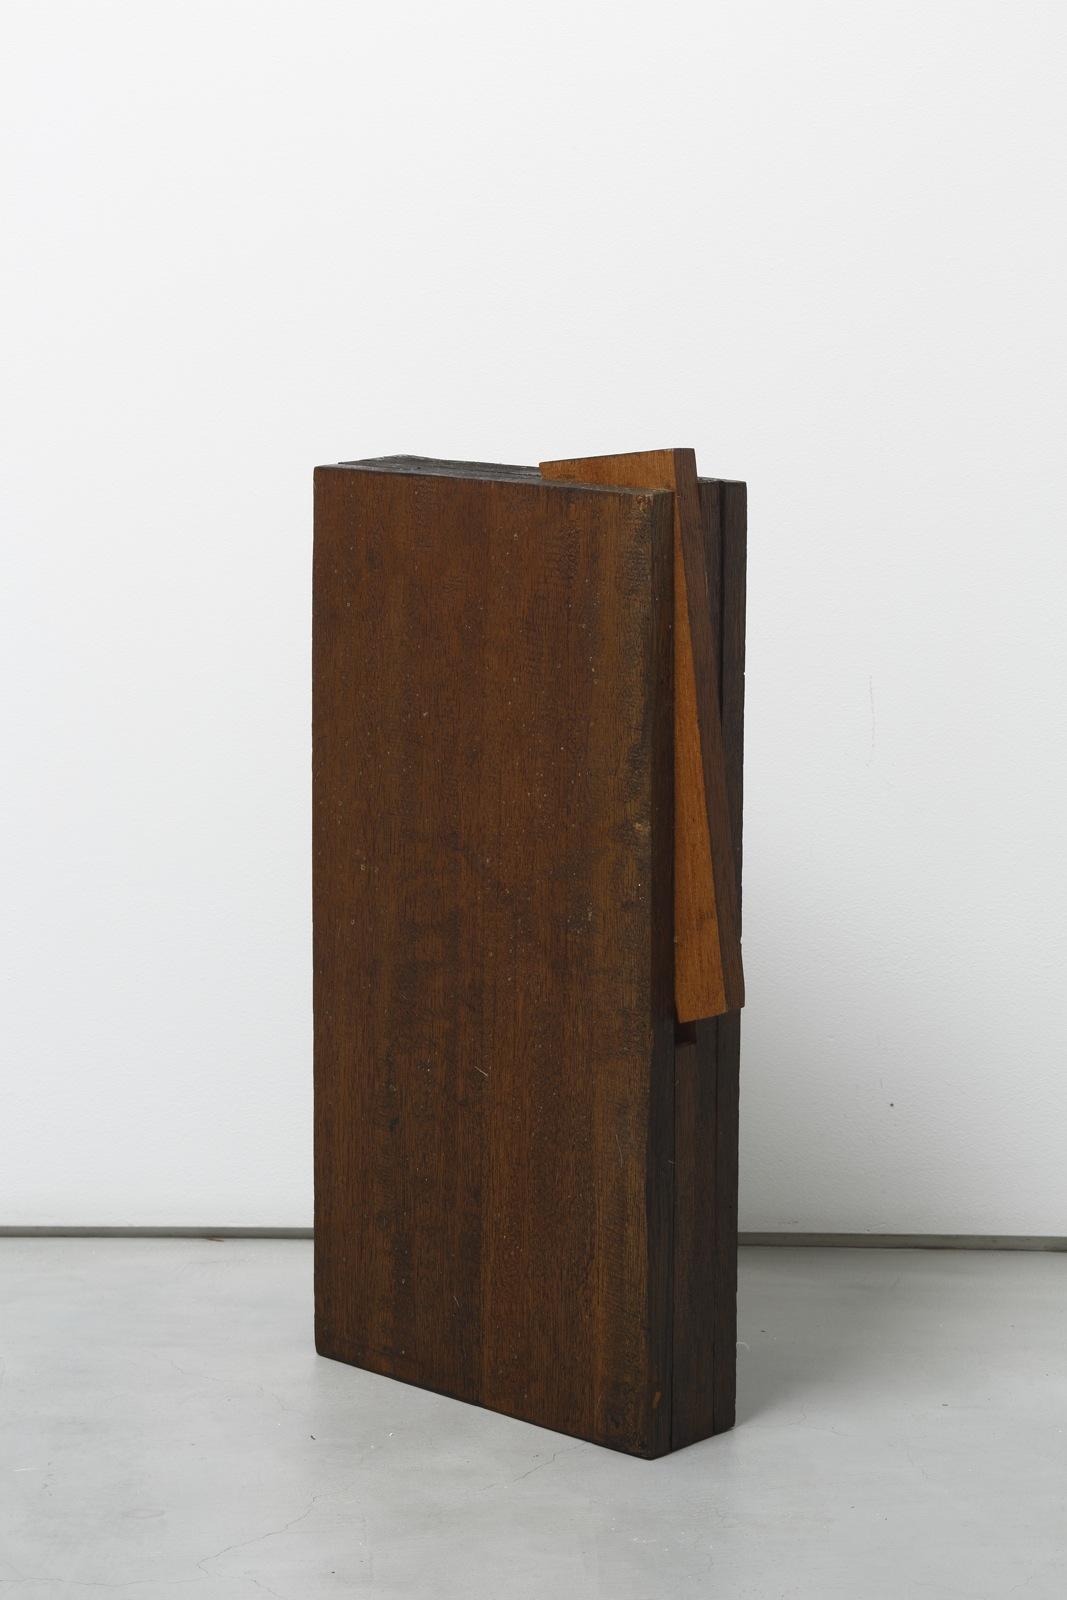 Kishio Suga  Detached Space on the Edge,  1980 辺の離空 ( Hen no Rikū ) Wood, varnish19 3/4 x 10 3/4 x 2 3/4 inches 50.2 x 27 x 7 centimeters